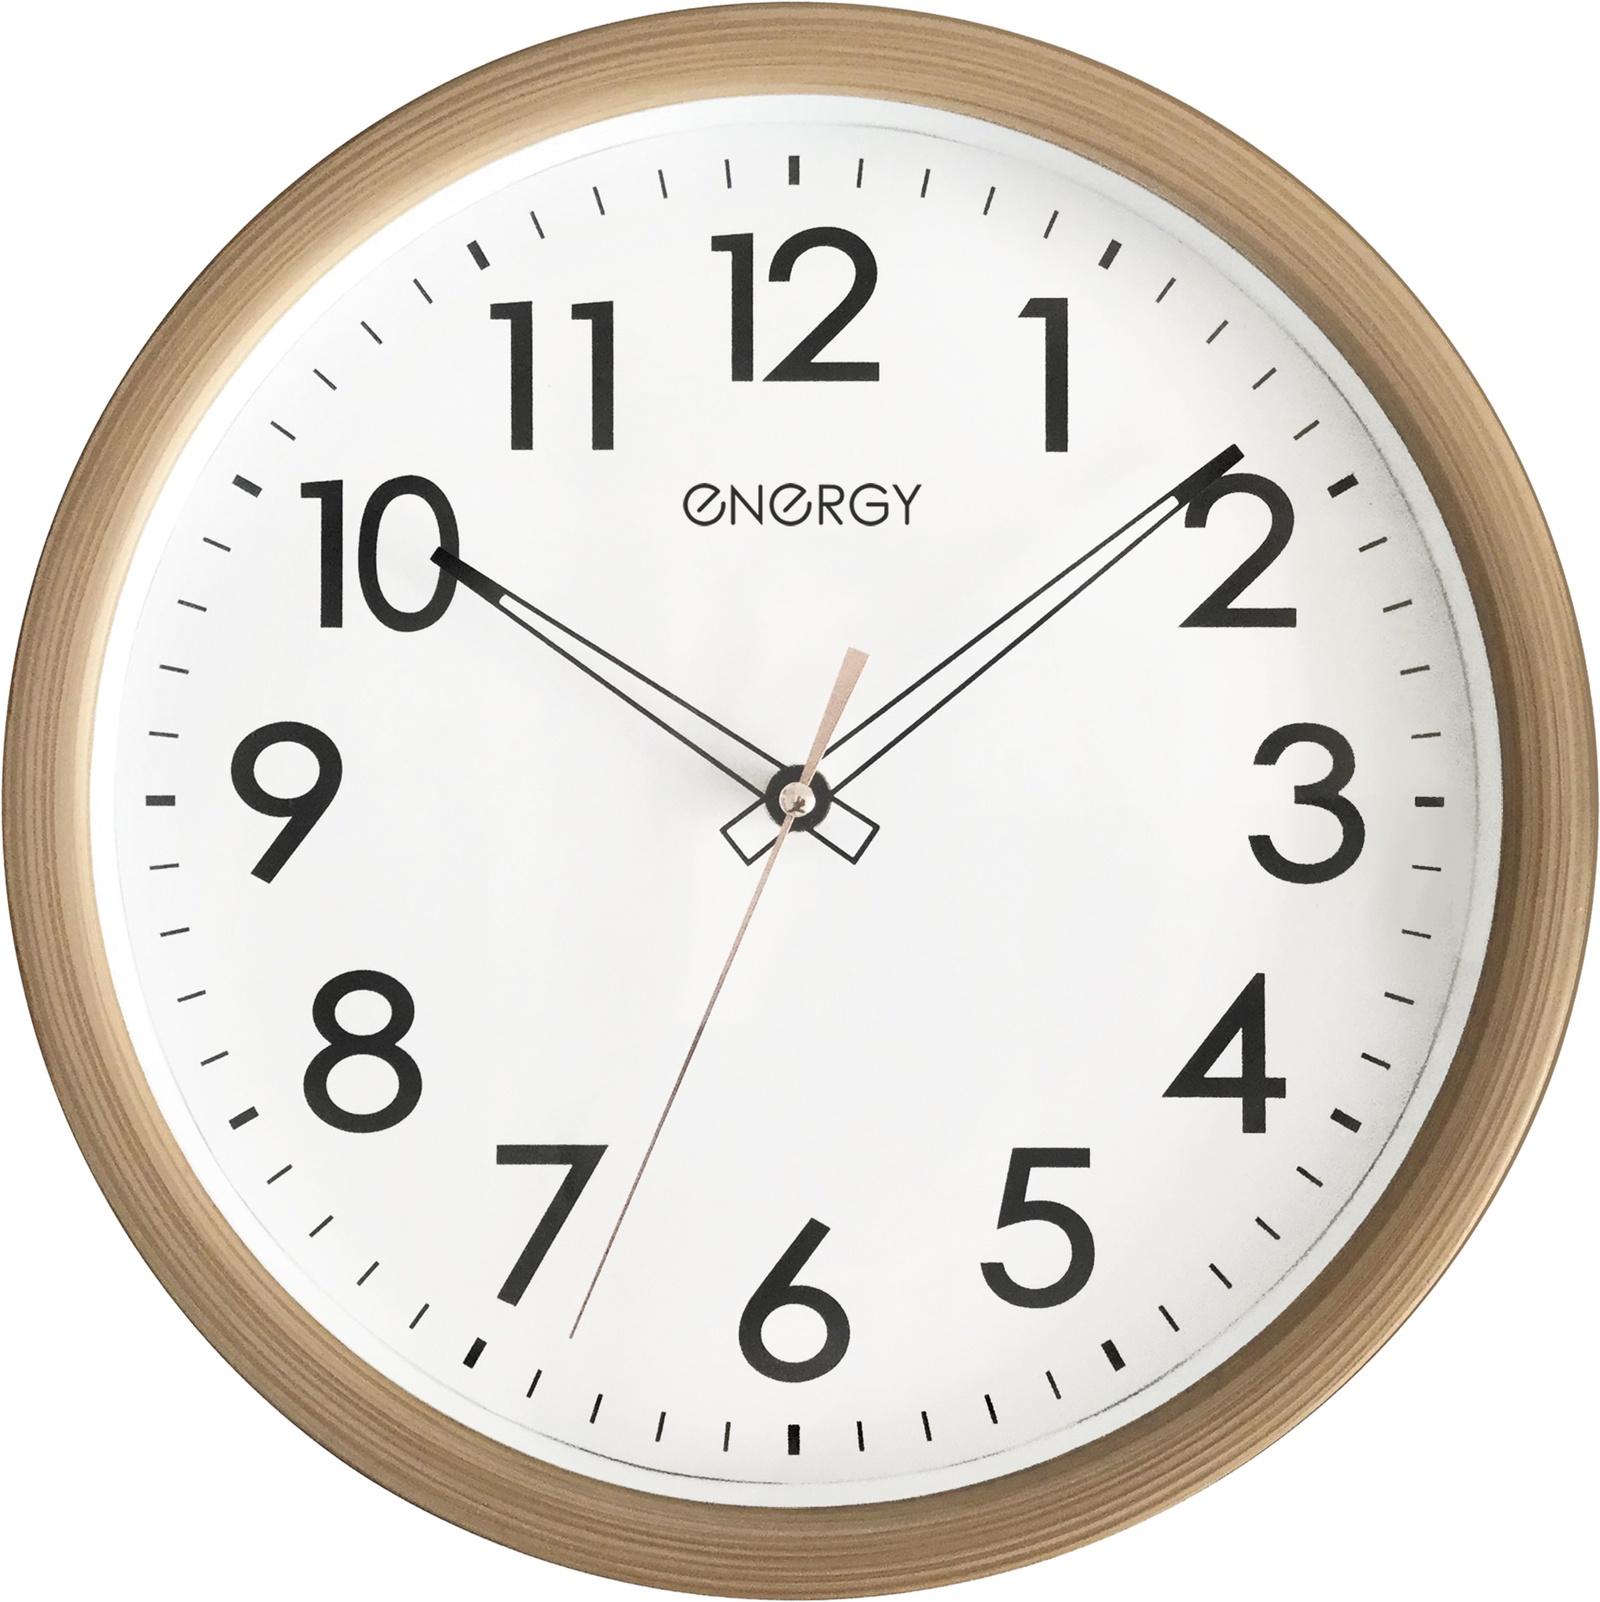 Настенные часы Energy под дерево цена 2017